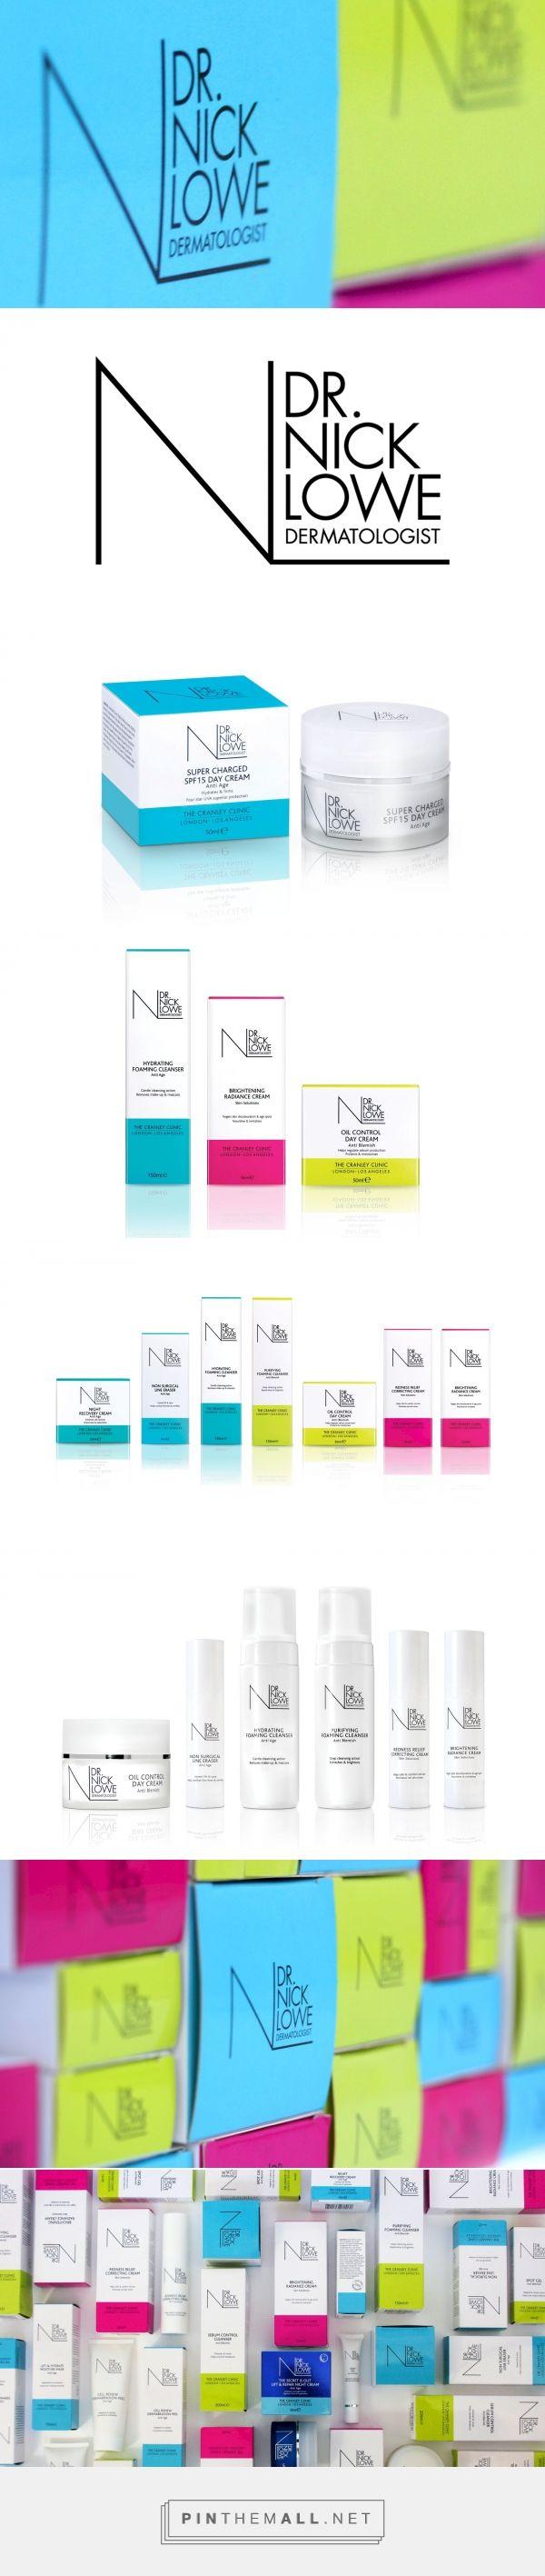 Dr. Lowe Skin Care Packaging by R Design | Fivestar Branding – Design and Branding Agency & Inspiration Gallery